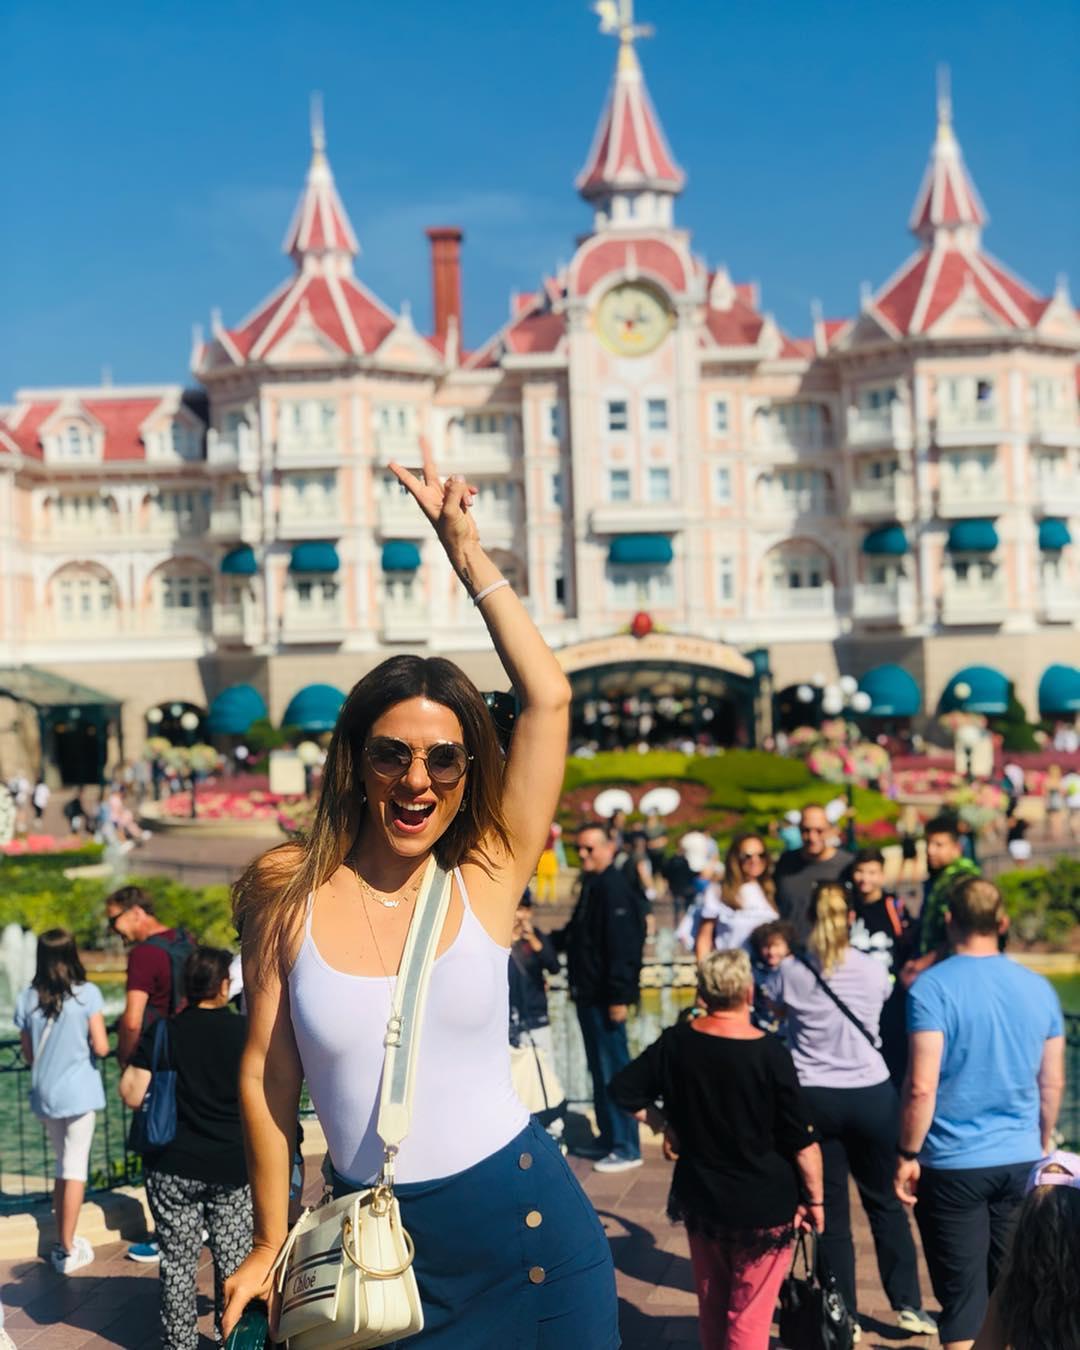 Bάσω Λασκαράκη: Μετά το γαμήλιο πάρτι στη Νάξο, ταξίδι στη Disneyland! [pic]